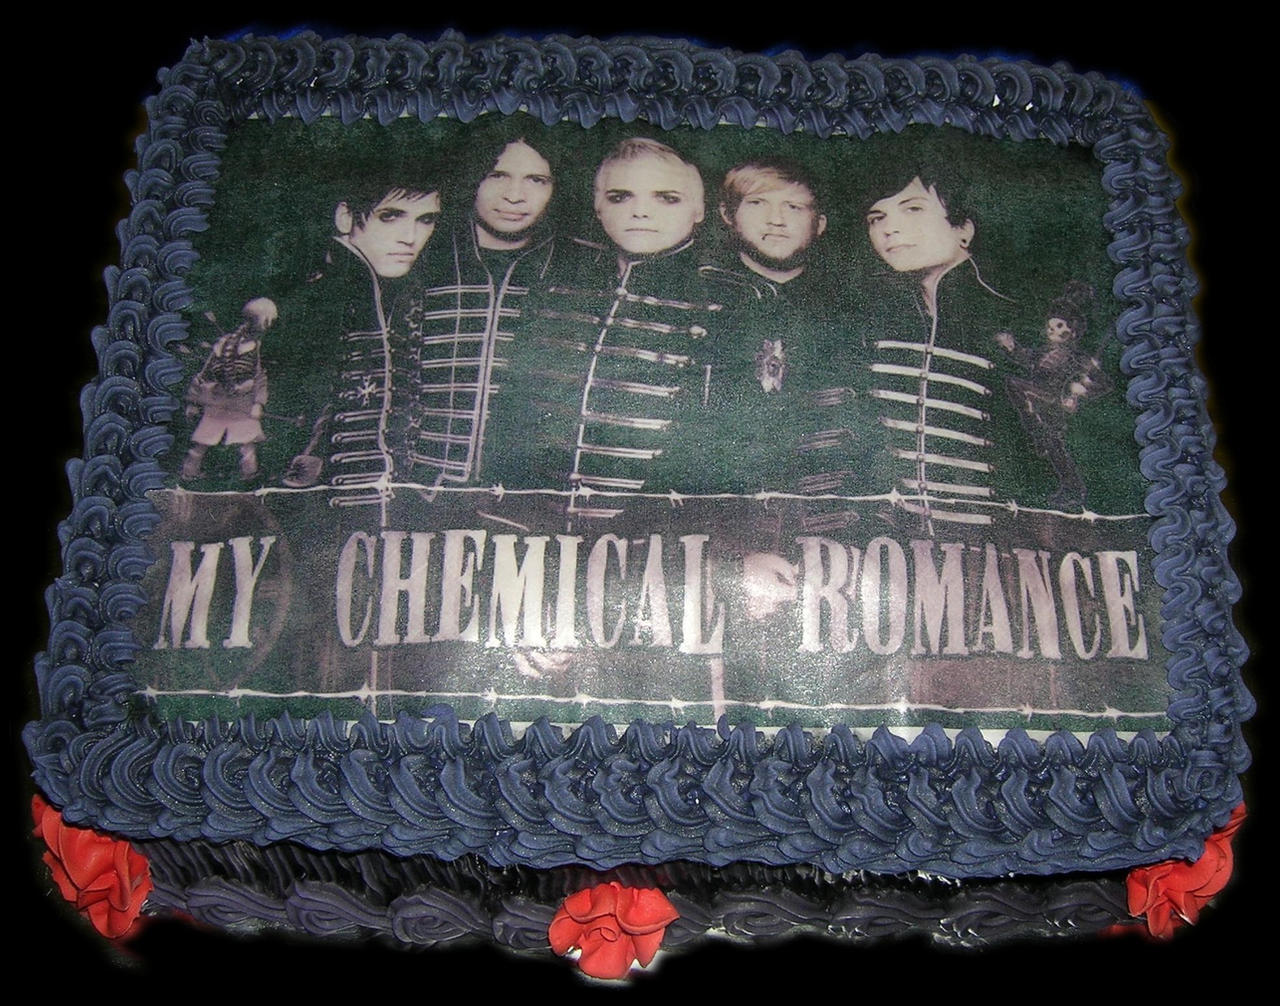 my chemical romance birthday cakes